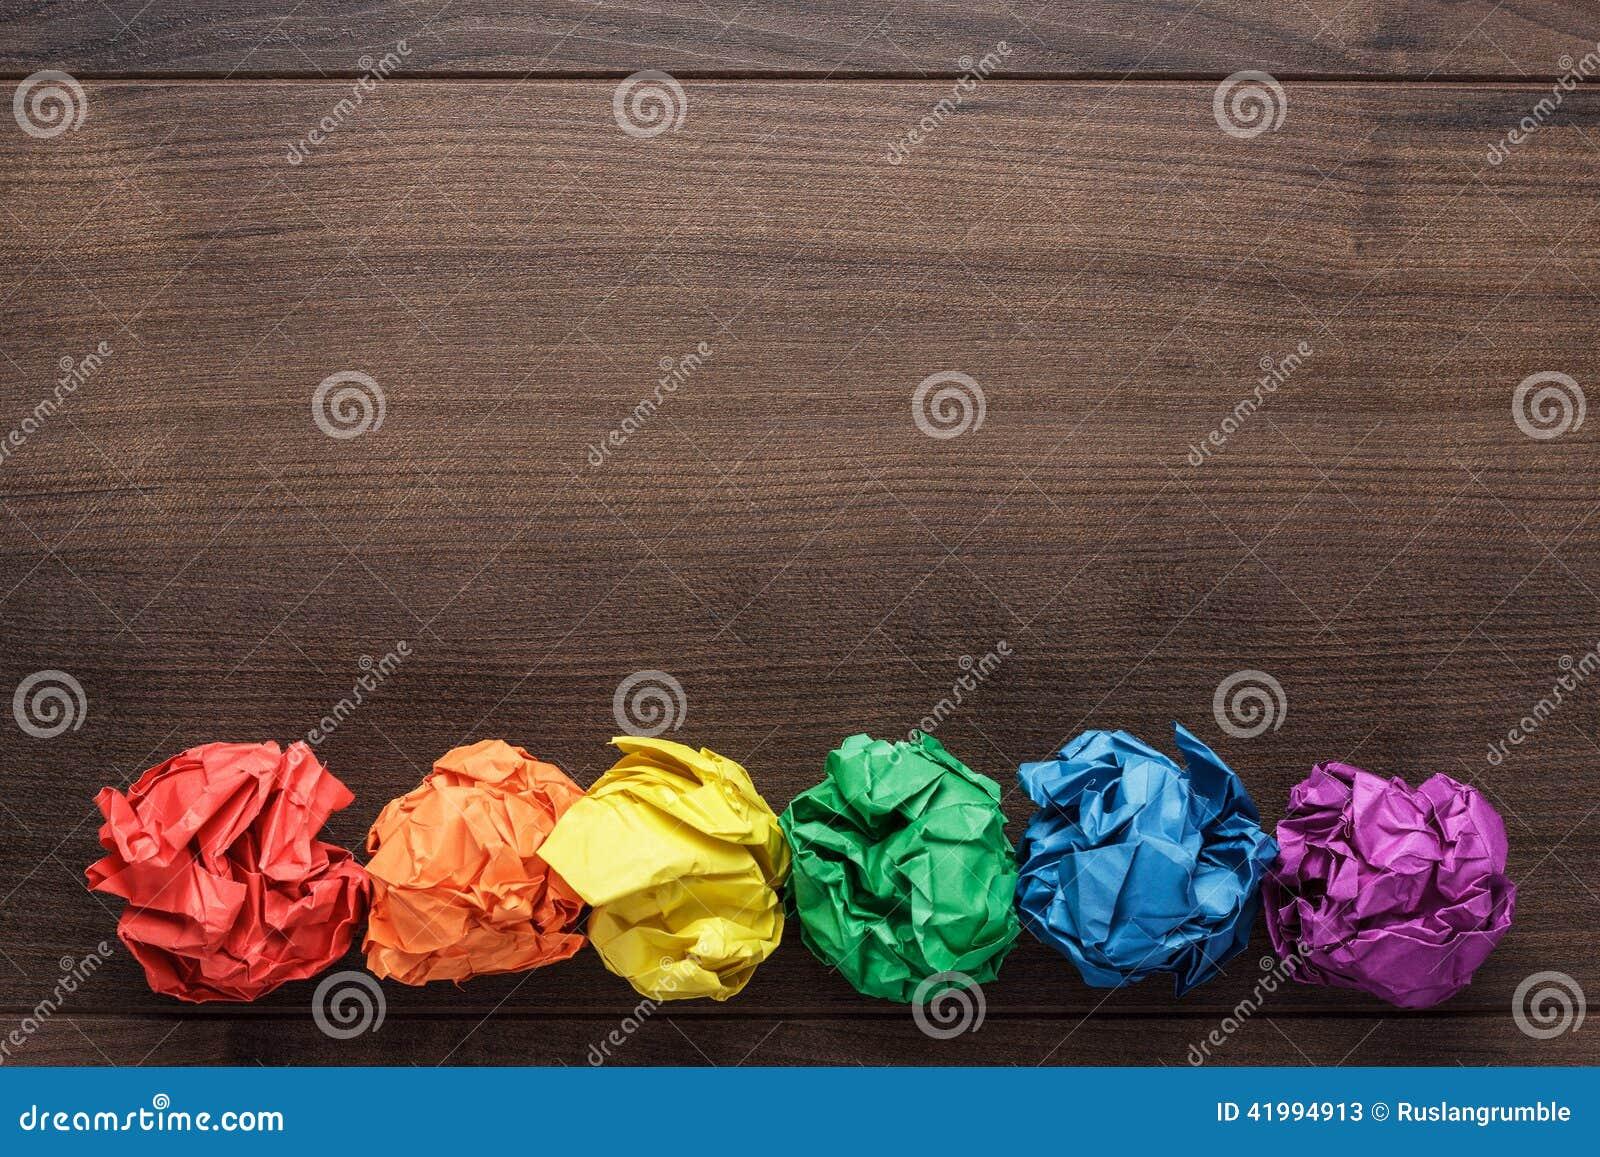 Papel colorido amarrotado no fundo de madeira